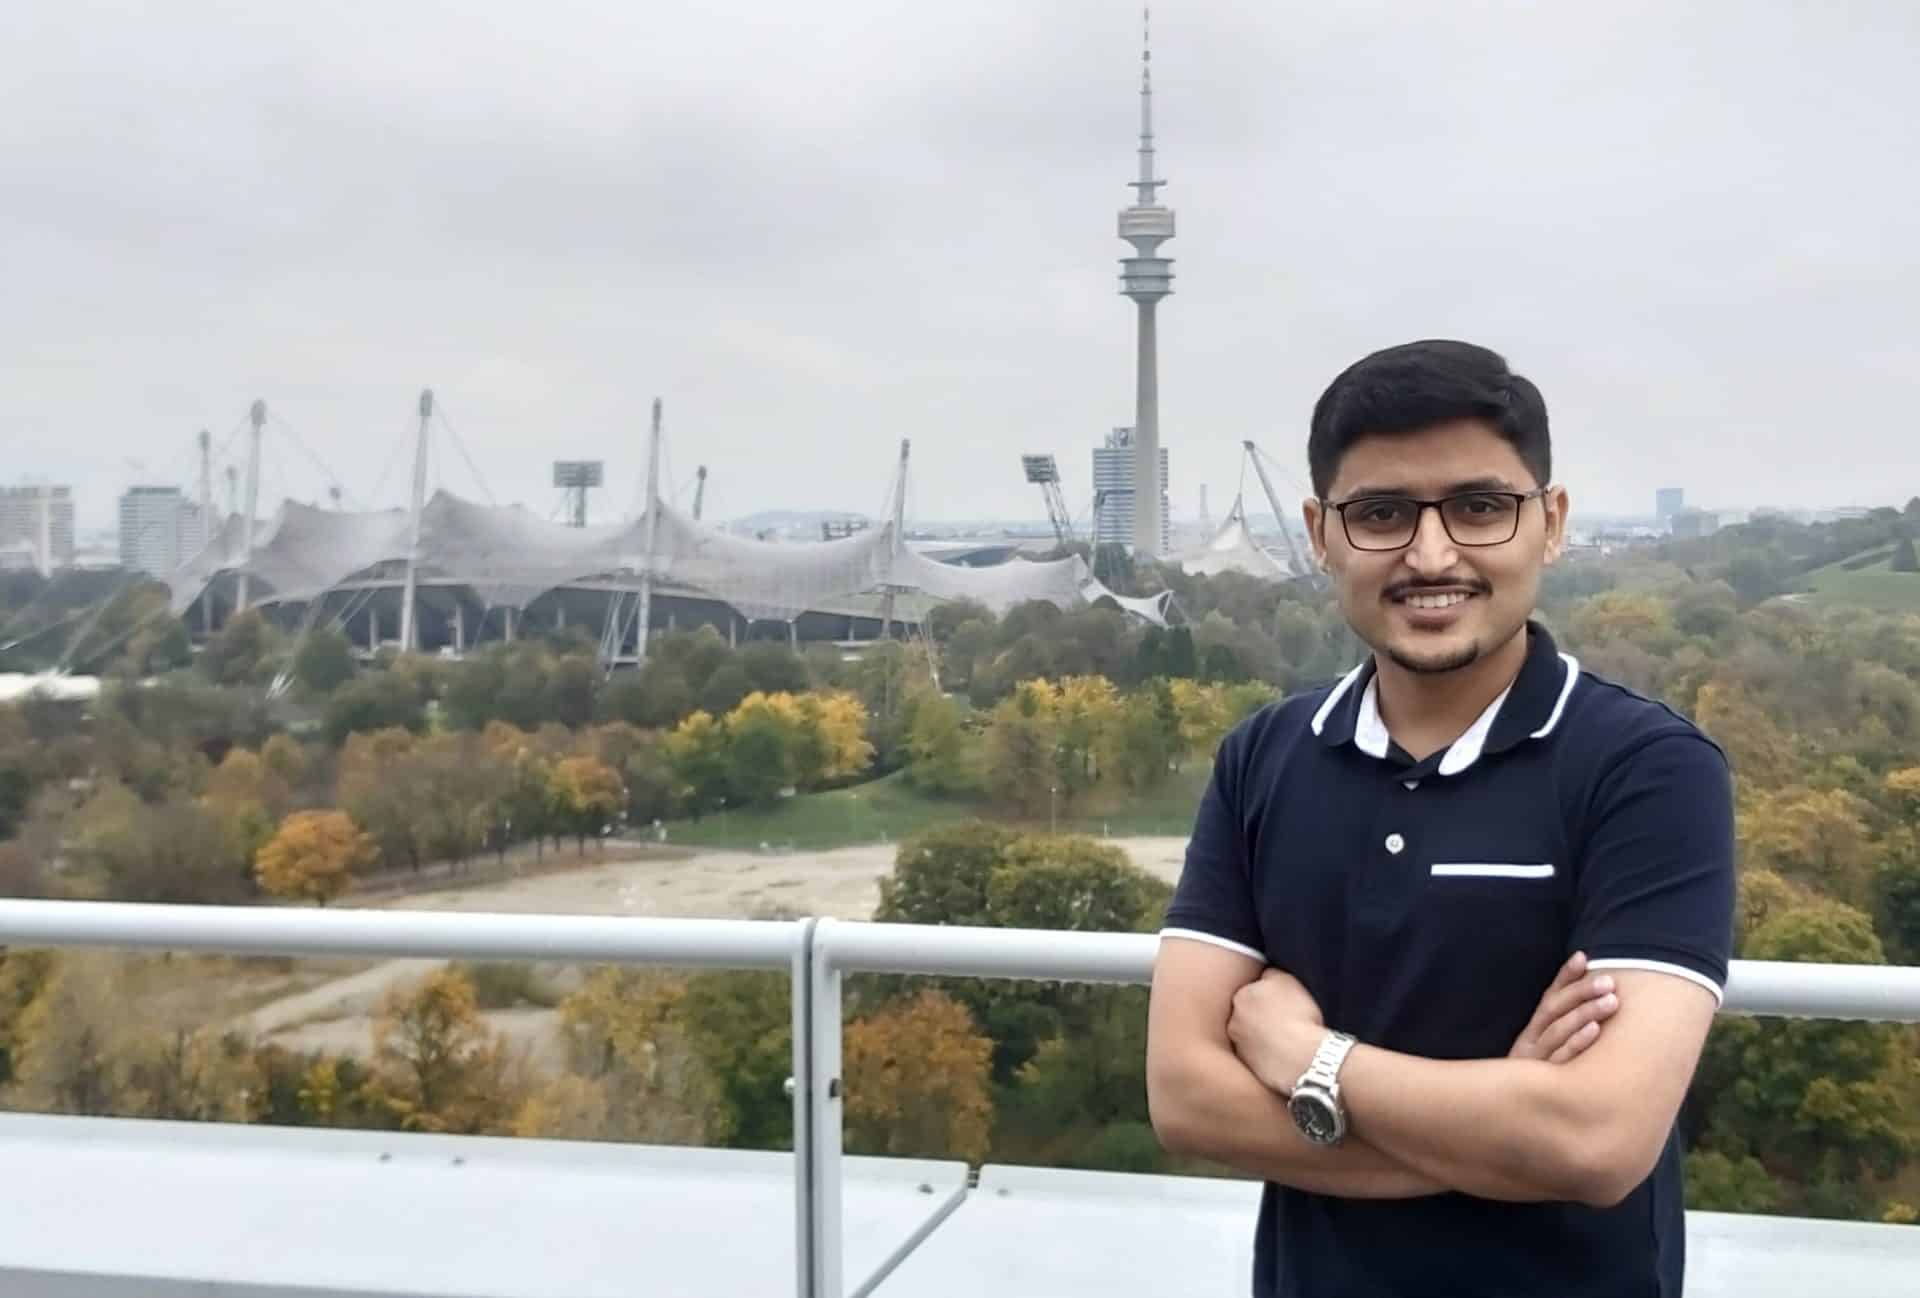 Syed Usama Jamil - Neuer AT Mitarbeiter